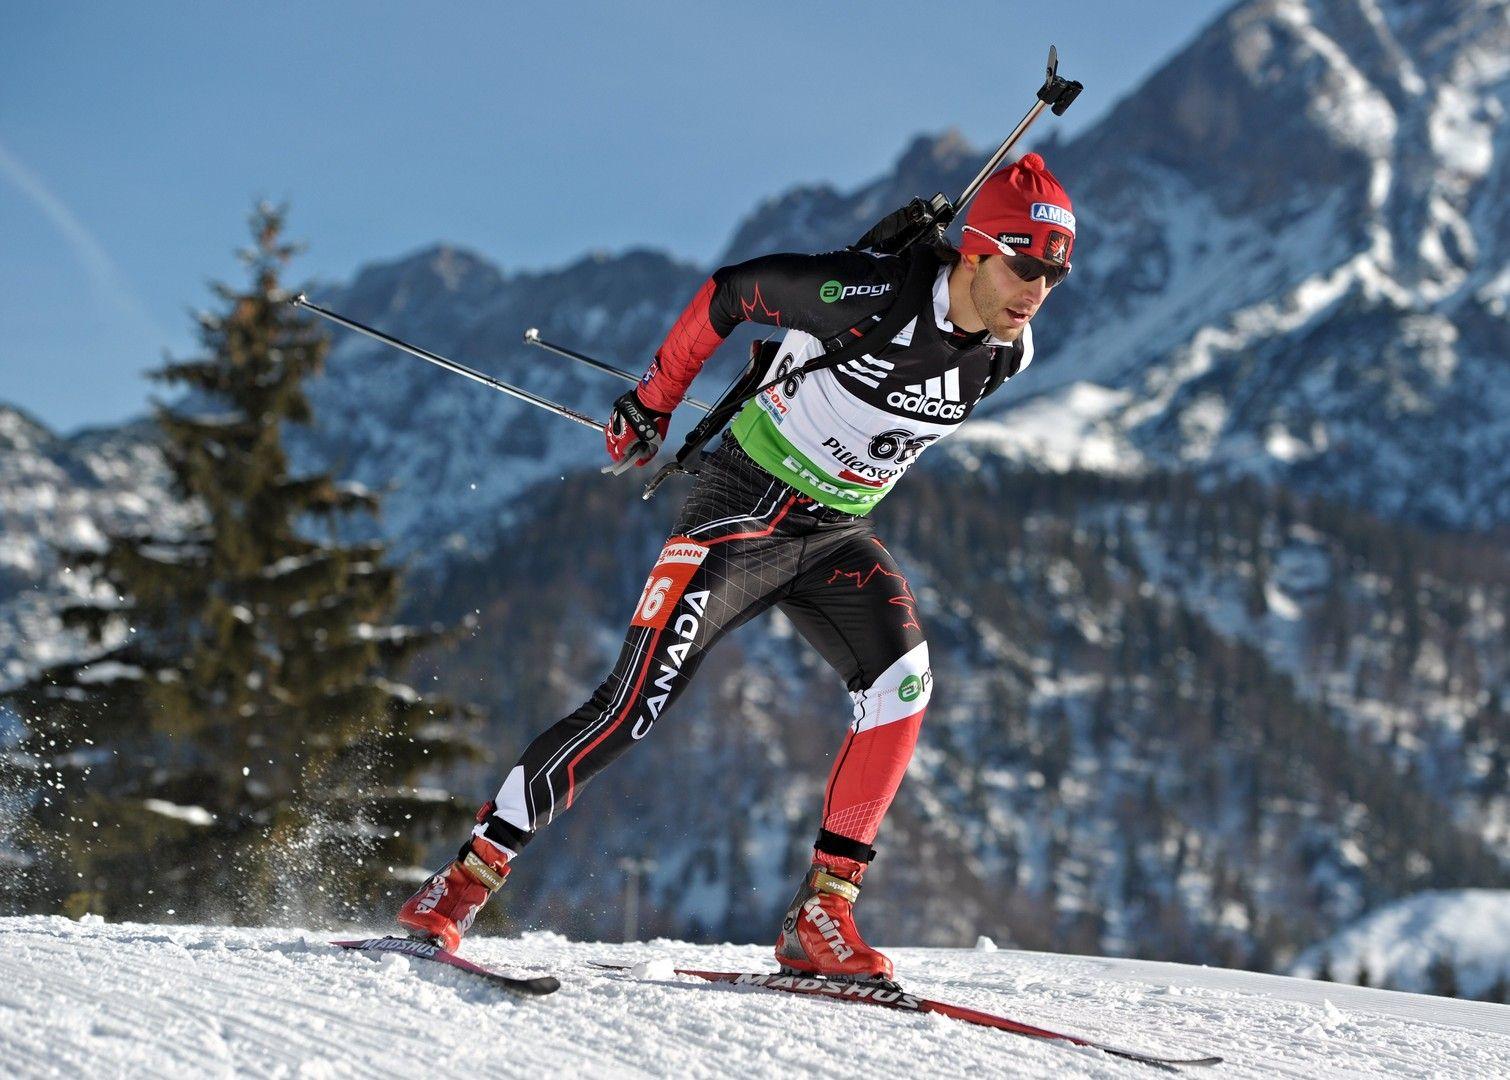 Biathlon Wallpaper